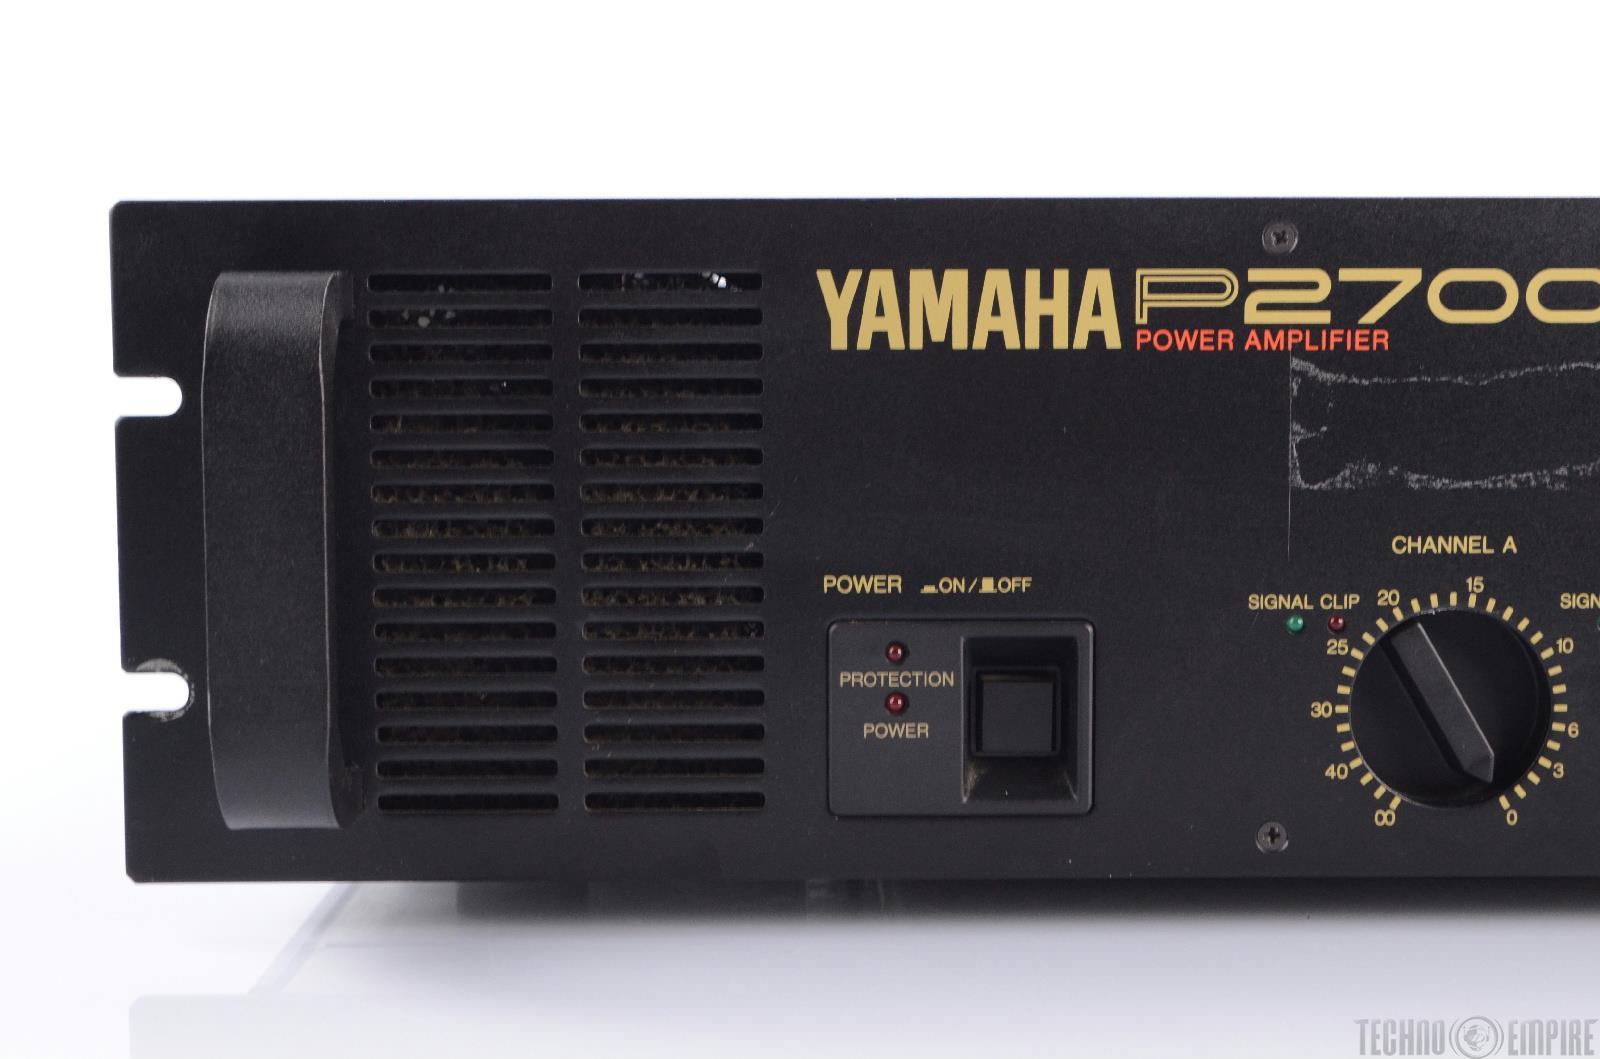 yamaha p2700 2 channel power amplifier 350w per ch 8 ohm 21988 ebay. Black Bedroom Furniture Sets. Home Design Ideas